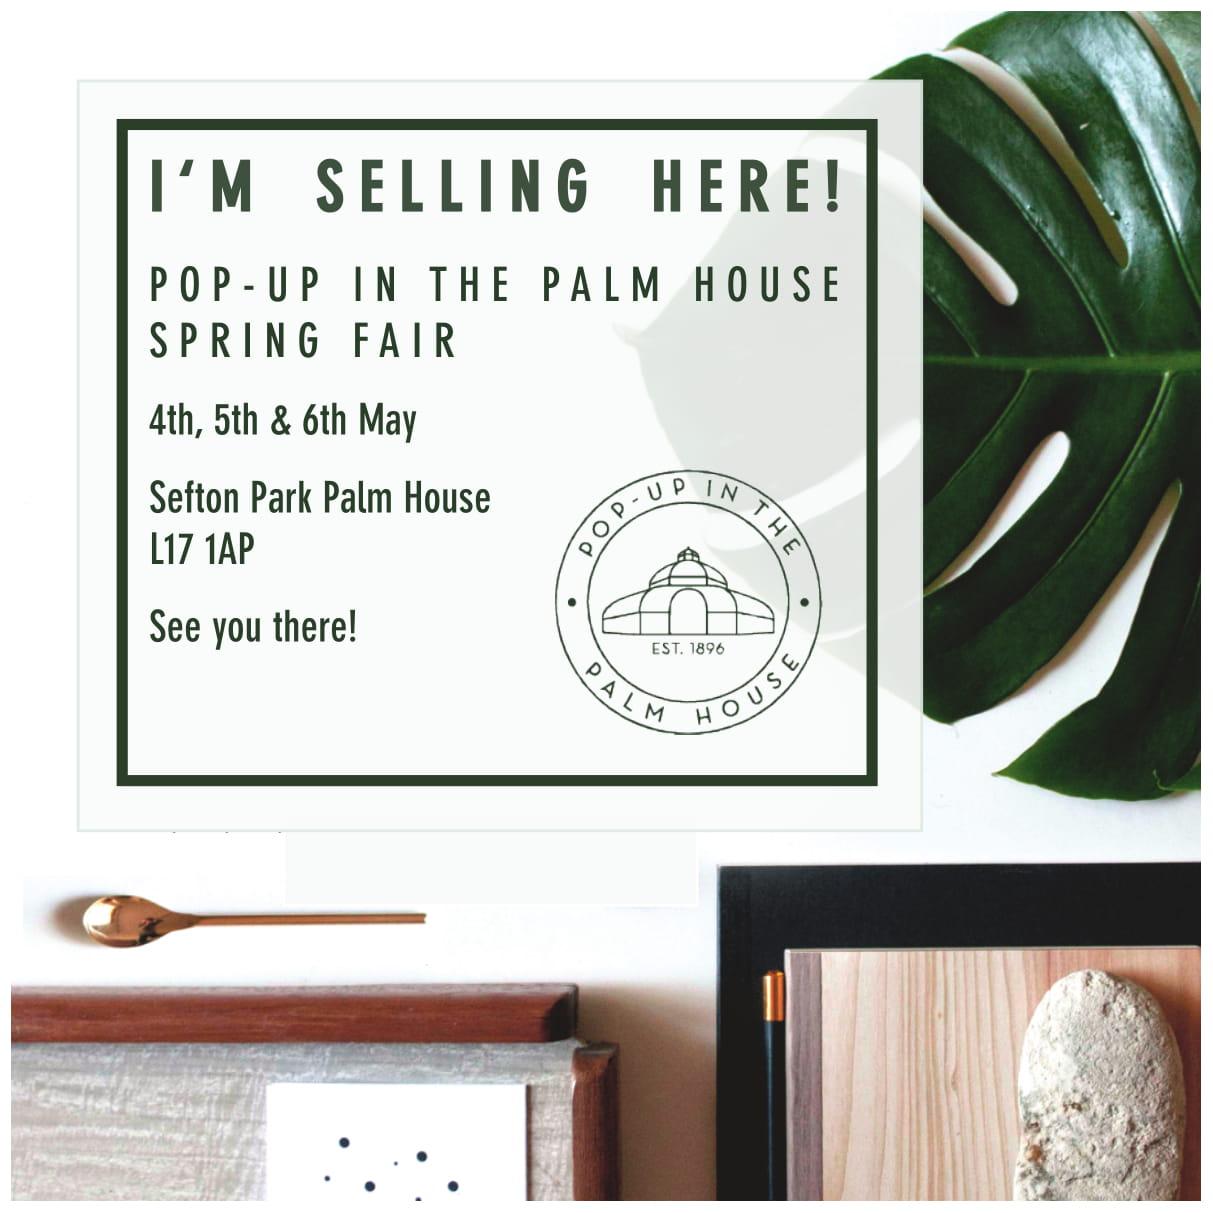 Pop-up in the Palllm House Spring Fair Flyer